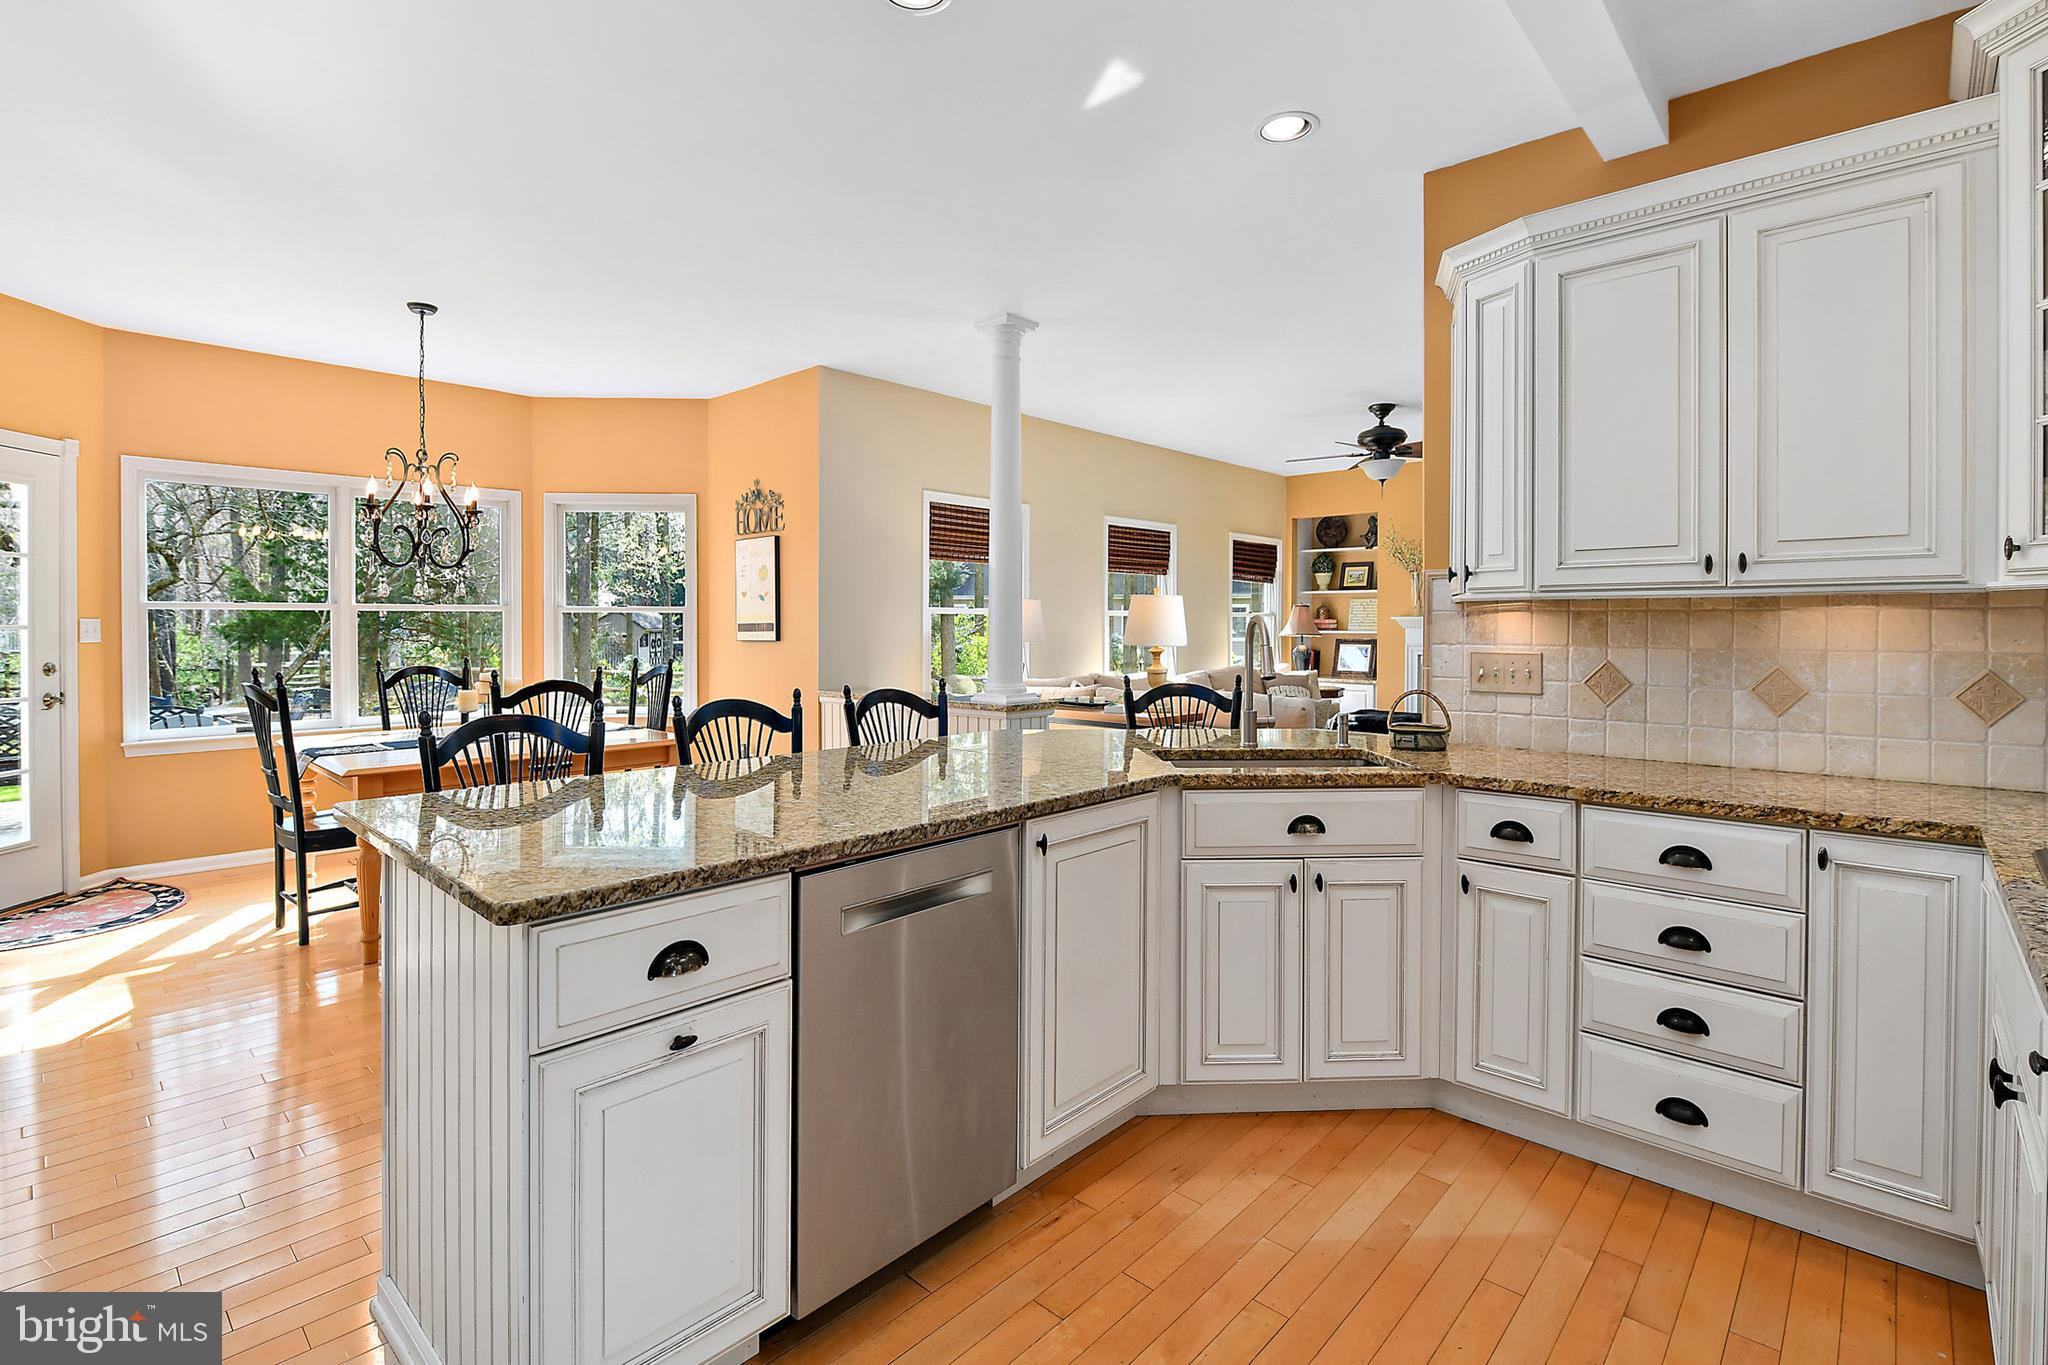 woodsman kitchens & floors inc 12004 Woodsman Point Road Bishopville MD 21813 SOLD LISTING MLS MDWO102372 RE MAX Of Reading